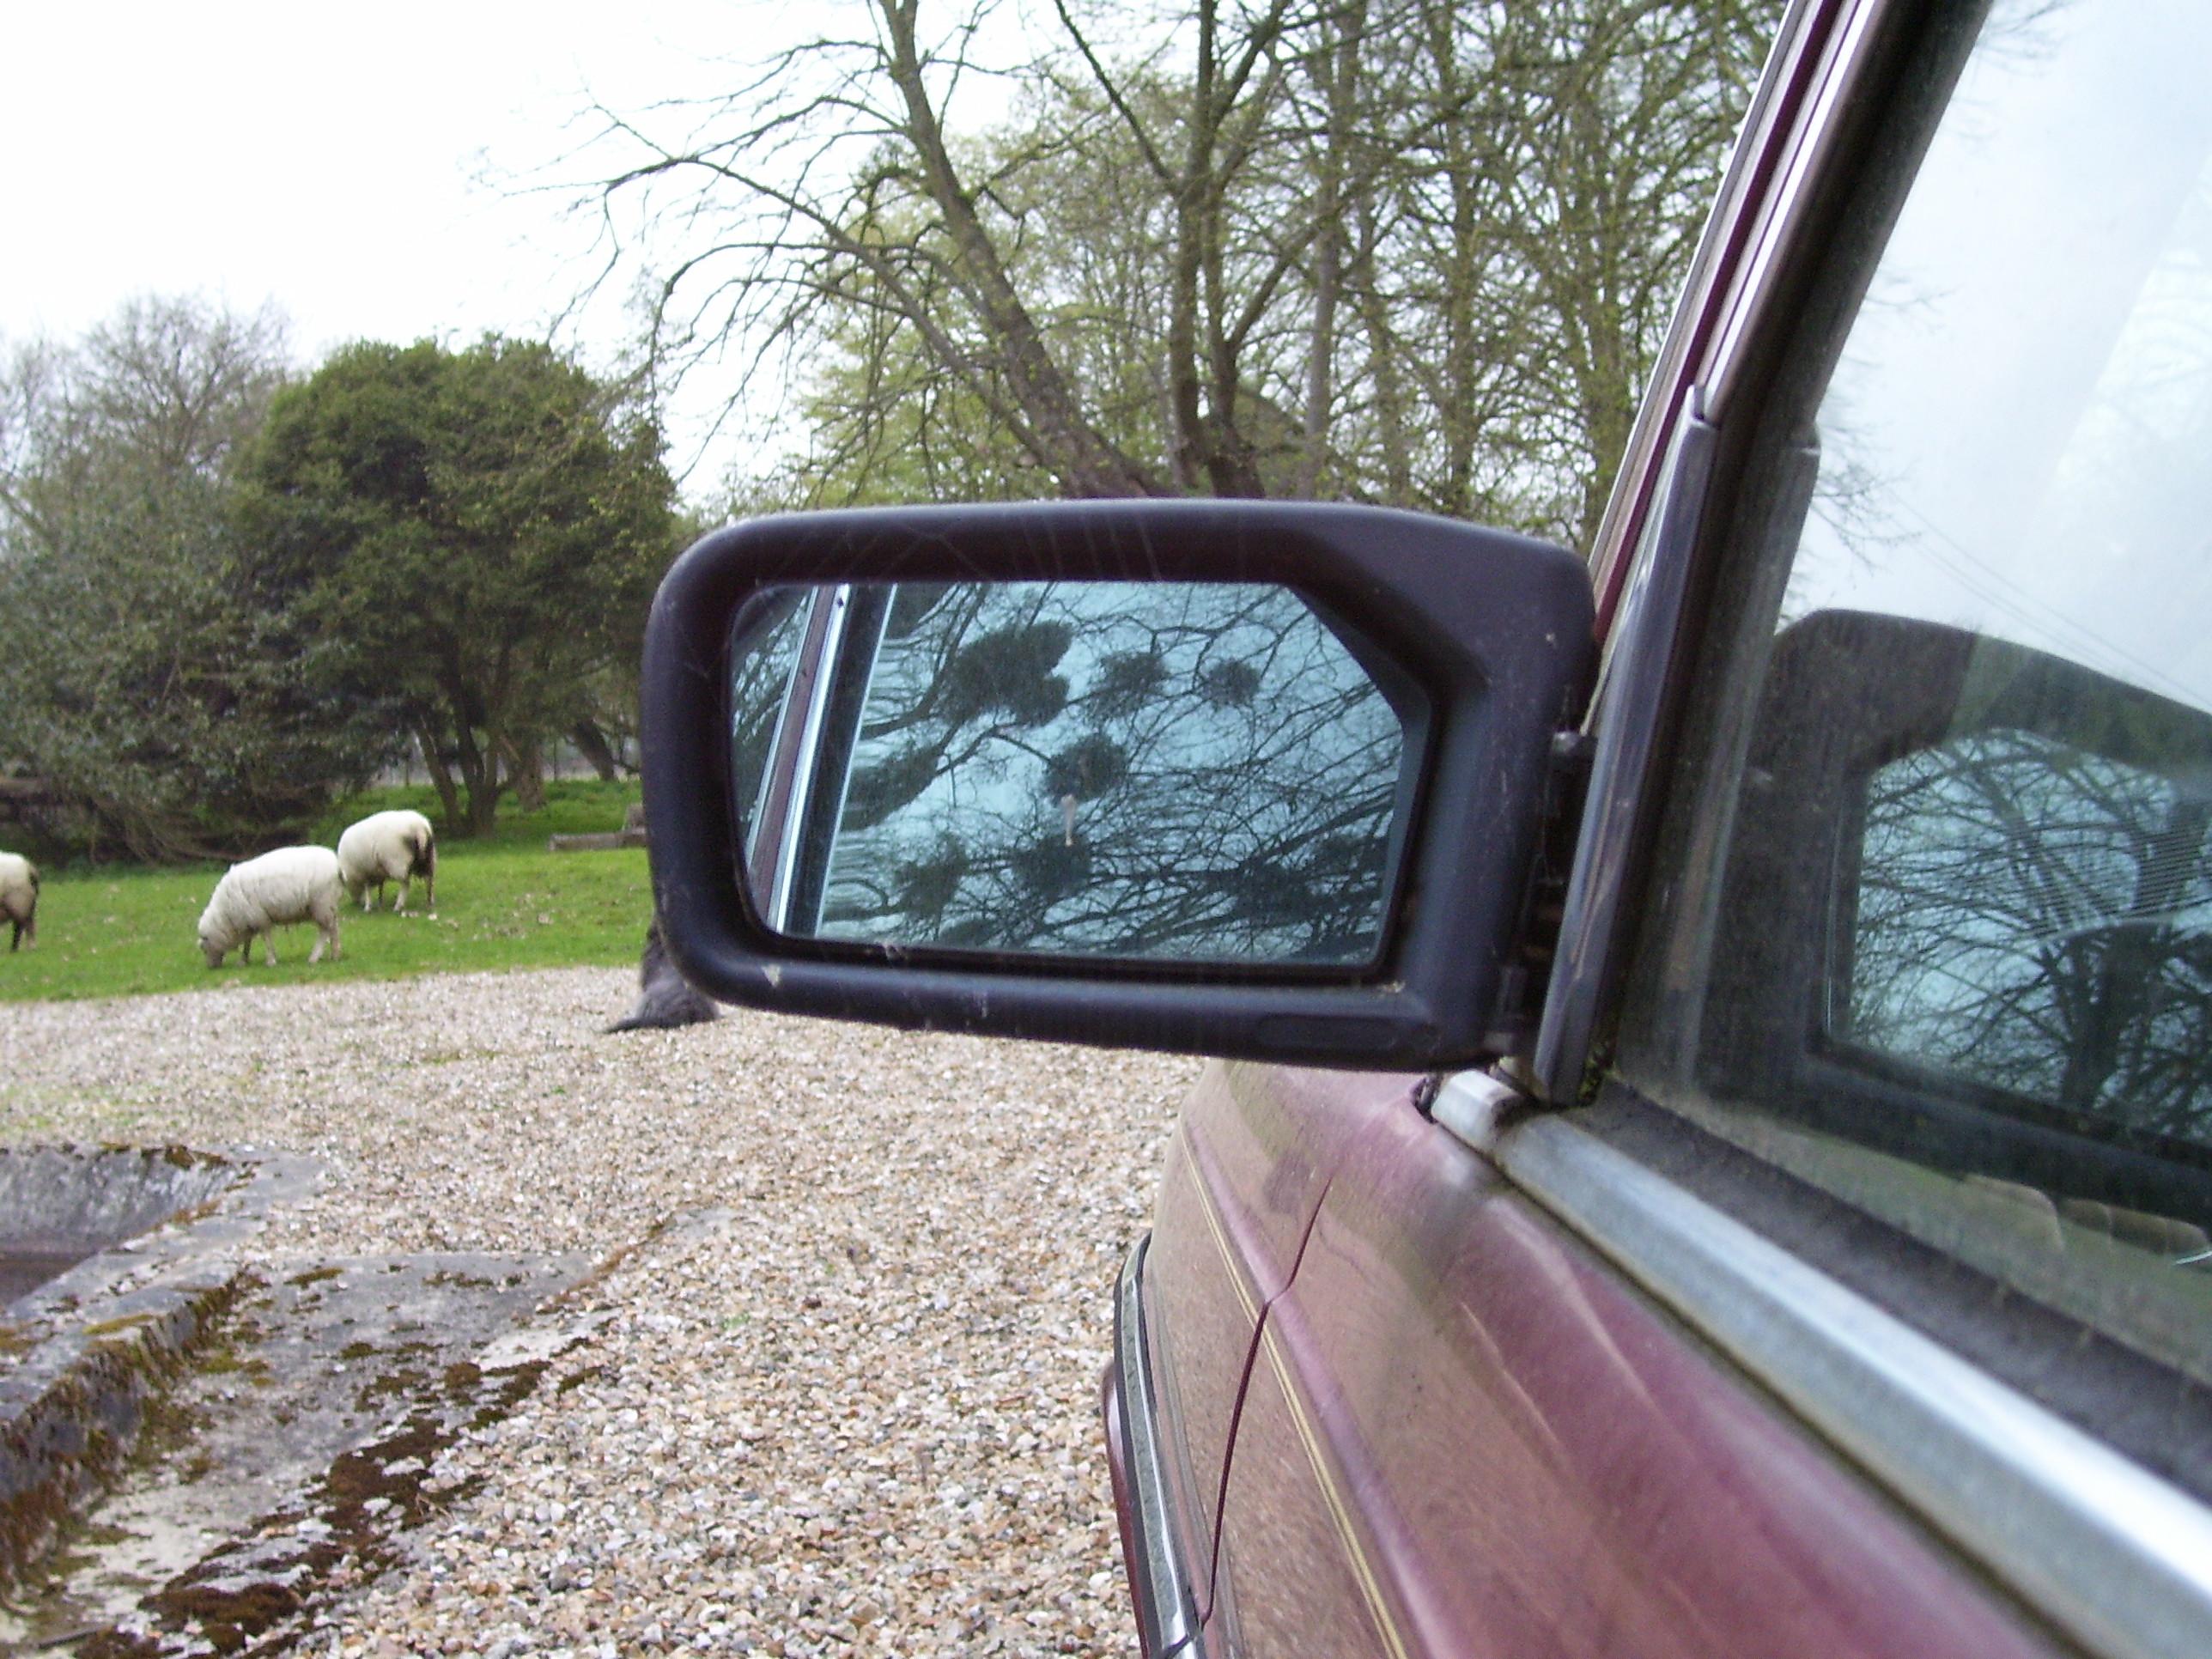 makkes car mirror glass sheep parked door